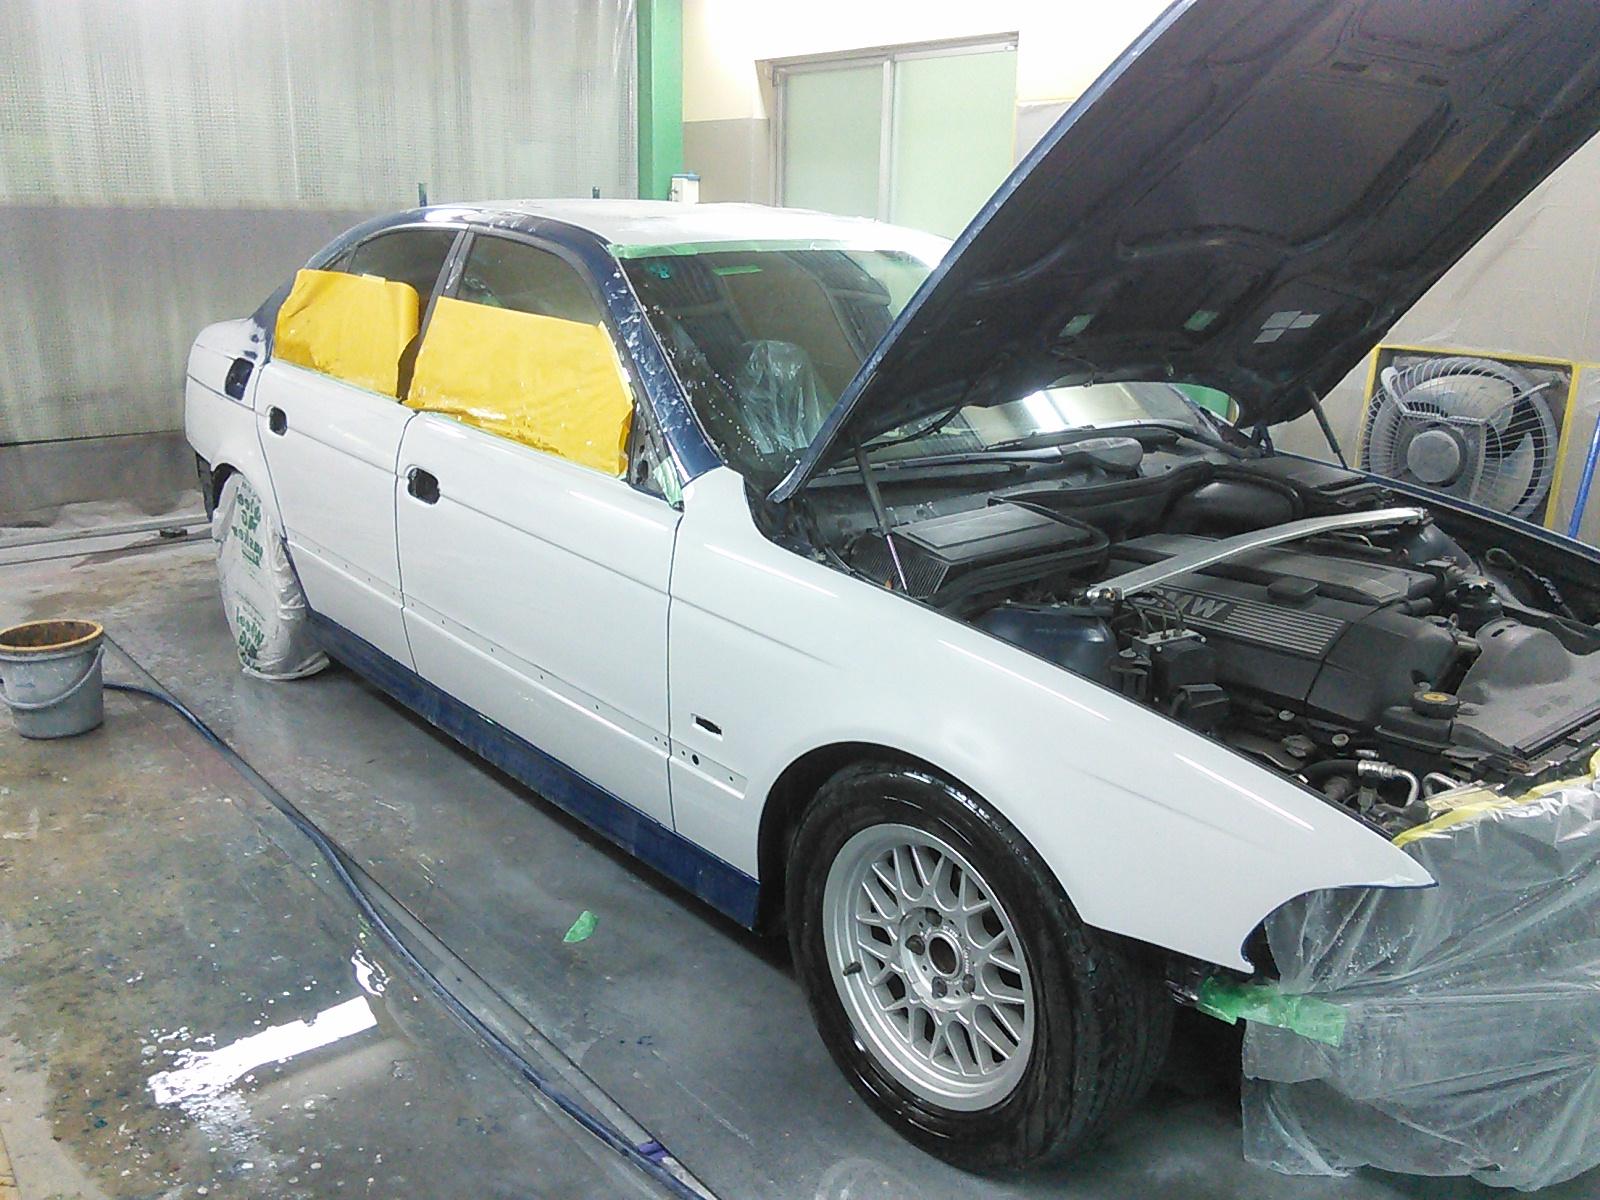 BMW 全塗装 を進めながら BMW バンパー修理  豊田市  板金塗装